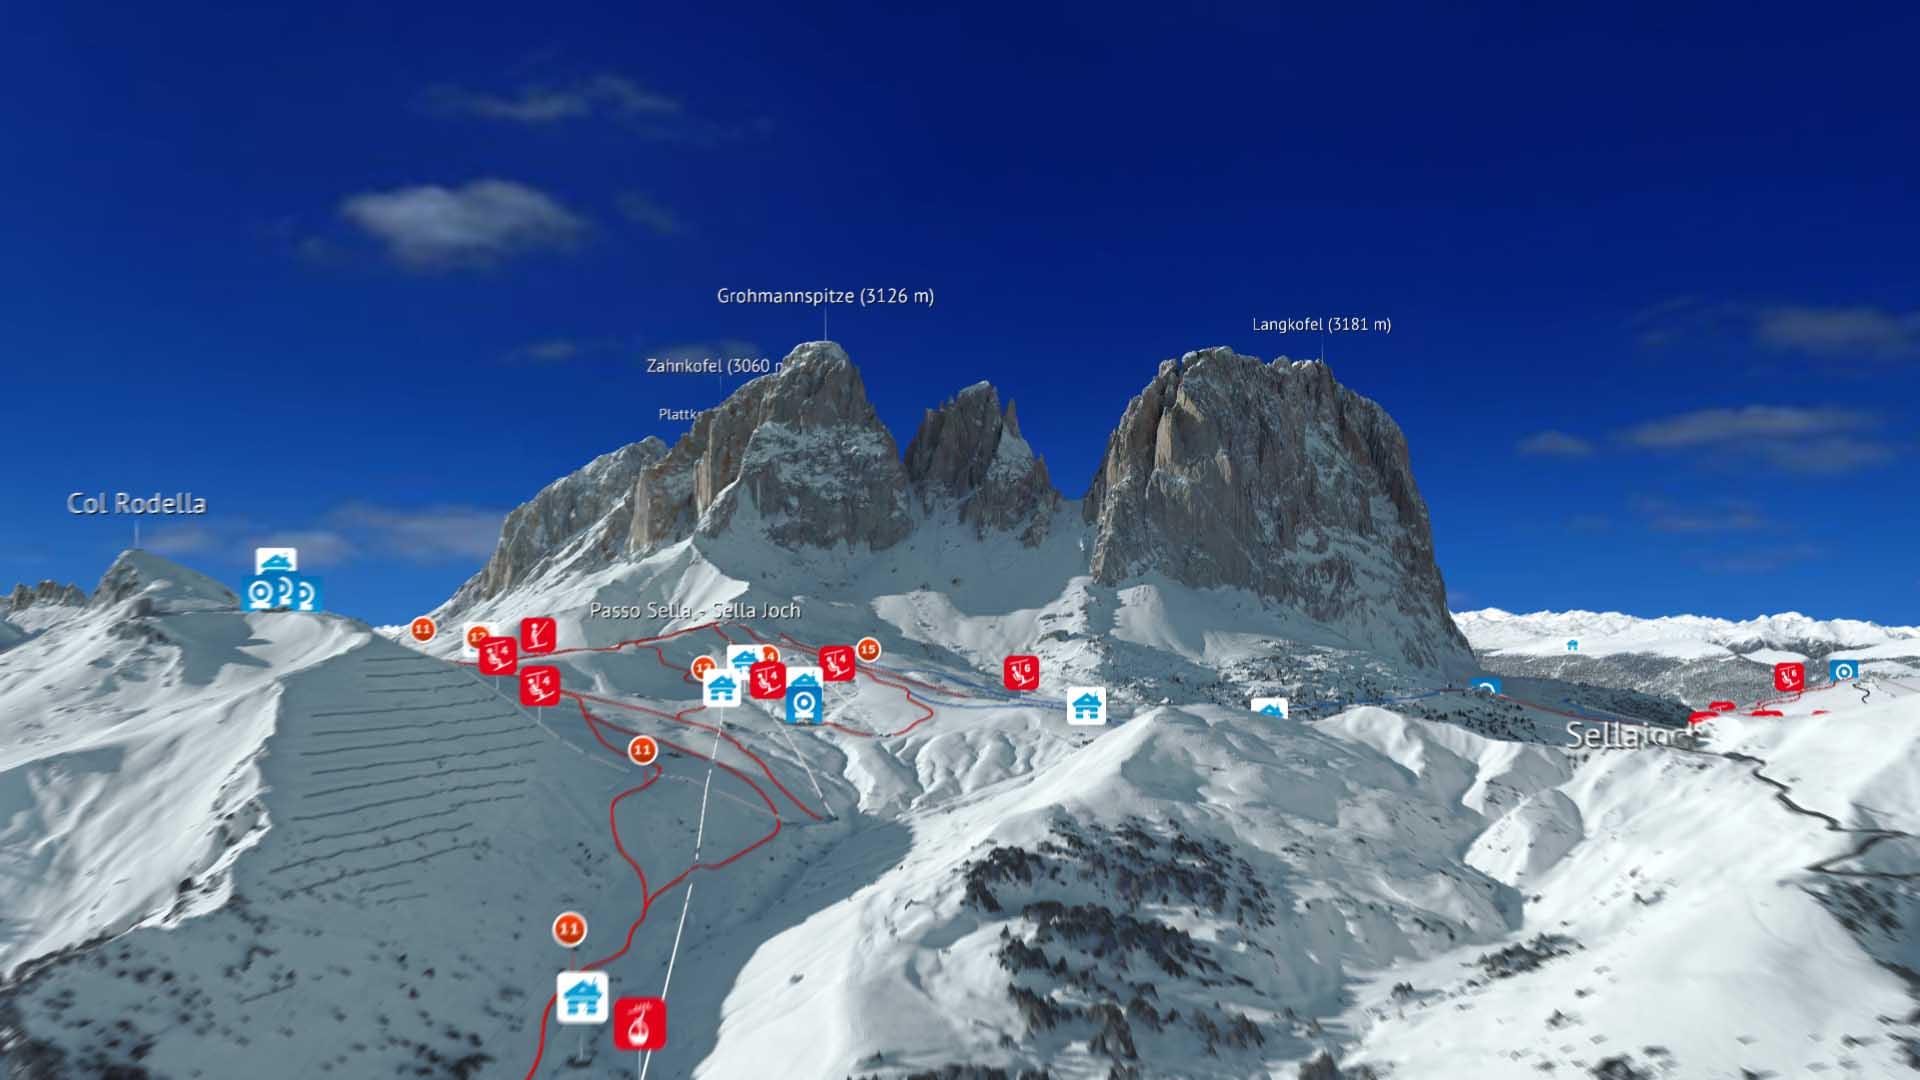 Neue interaktive Skigebietskarte Dolomiti Superski